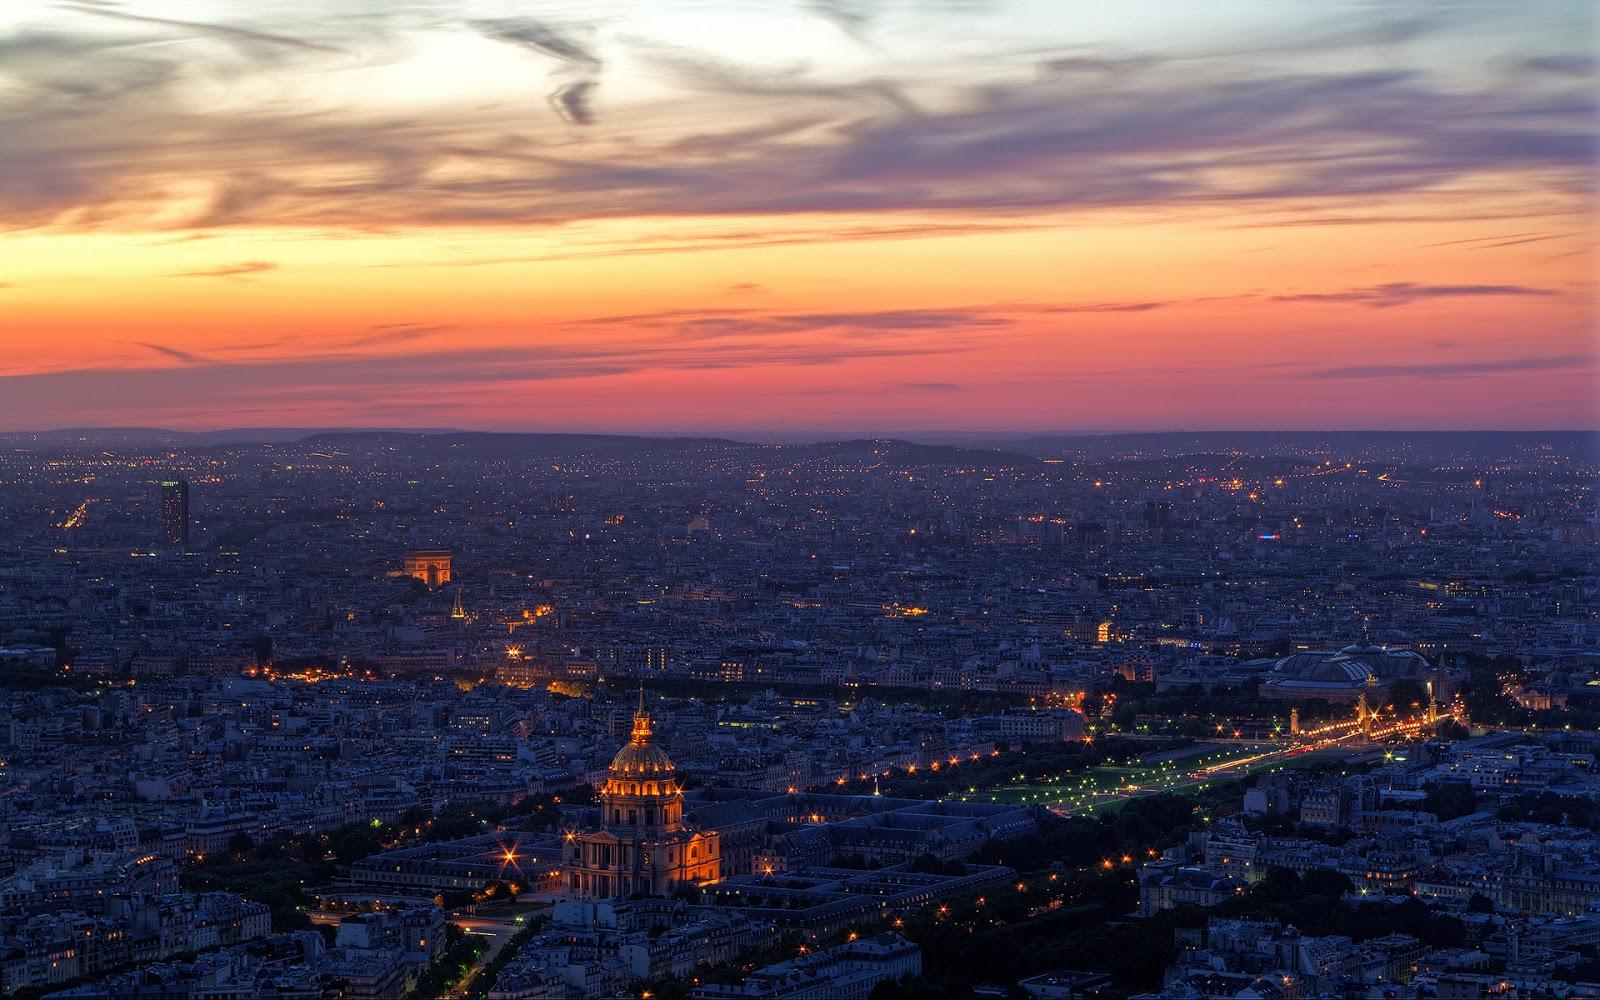 Paris at Night Wallpaper 1600x1000